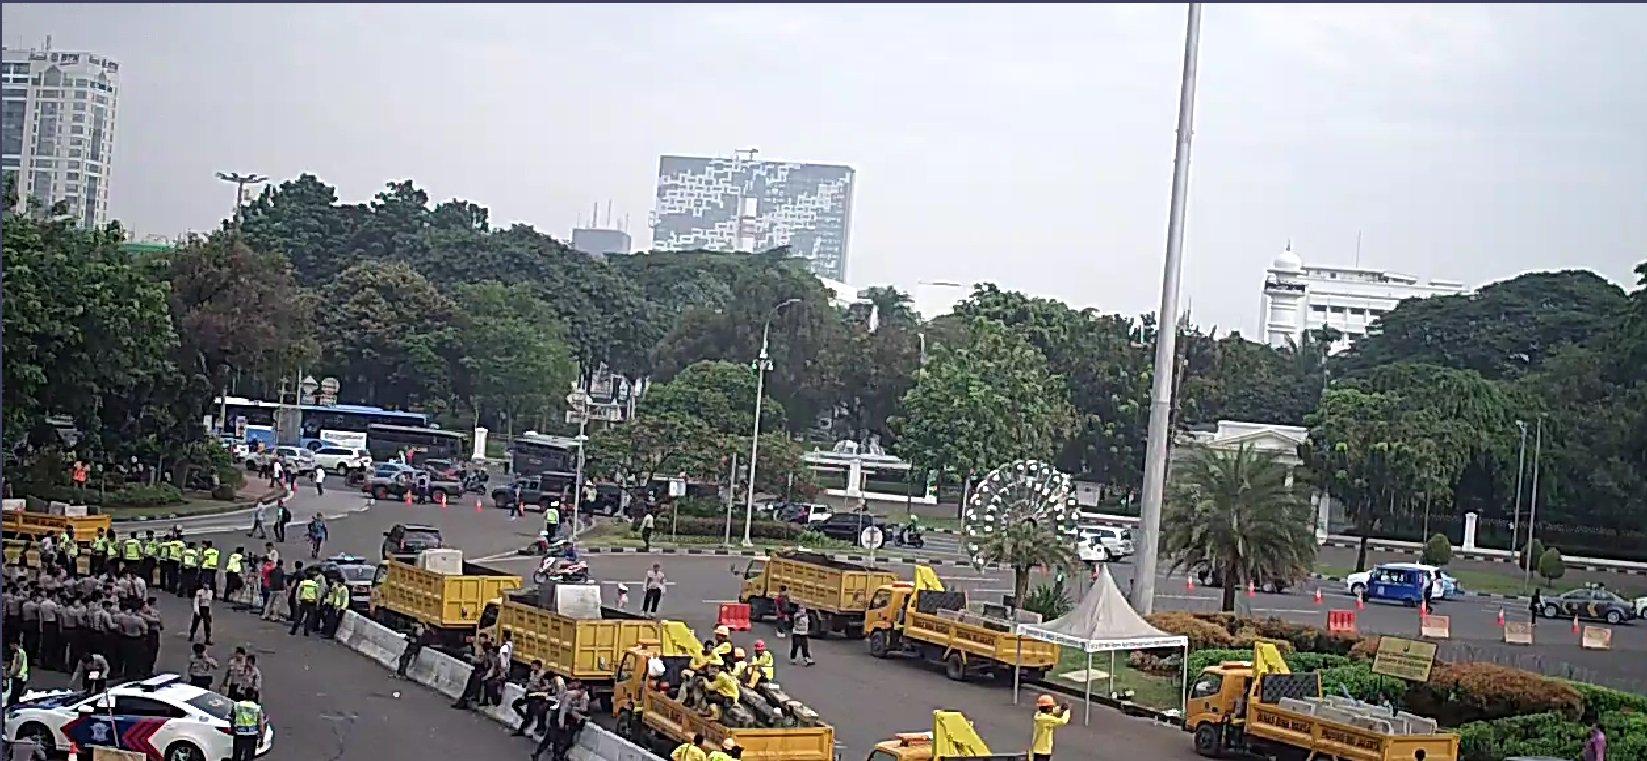 Lalu lintas di depan Istana Merdeka dan Jalan Medan Merdeka Barat, Jakarta Pusat, sebelum aksi demo pada Jumat pagi, 4 November 2016. Foto dari Twitter/@TMCPoldaMetro